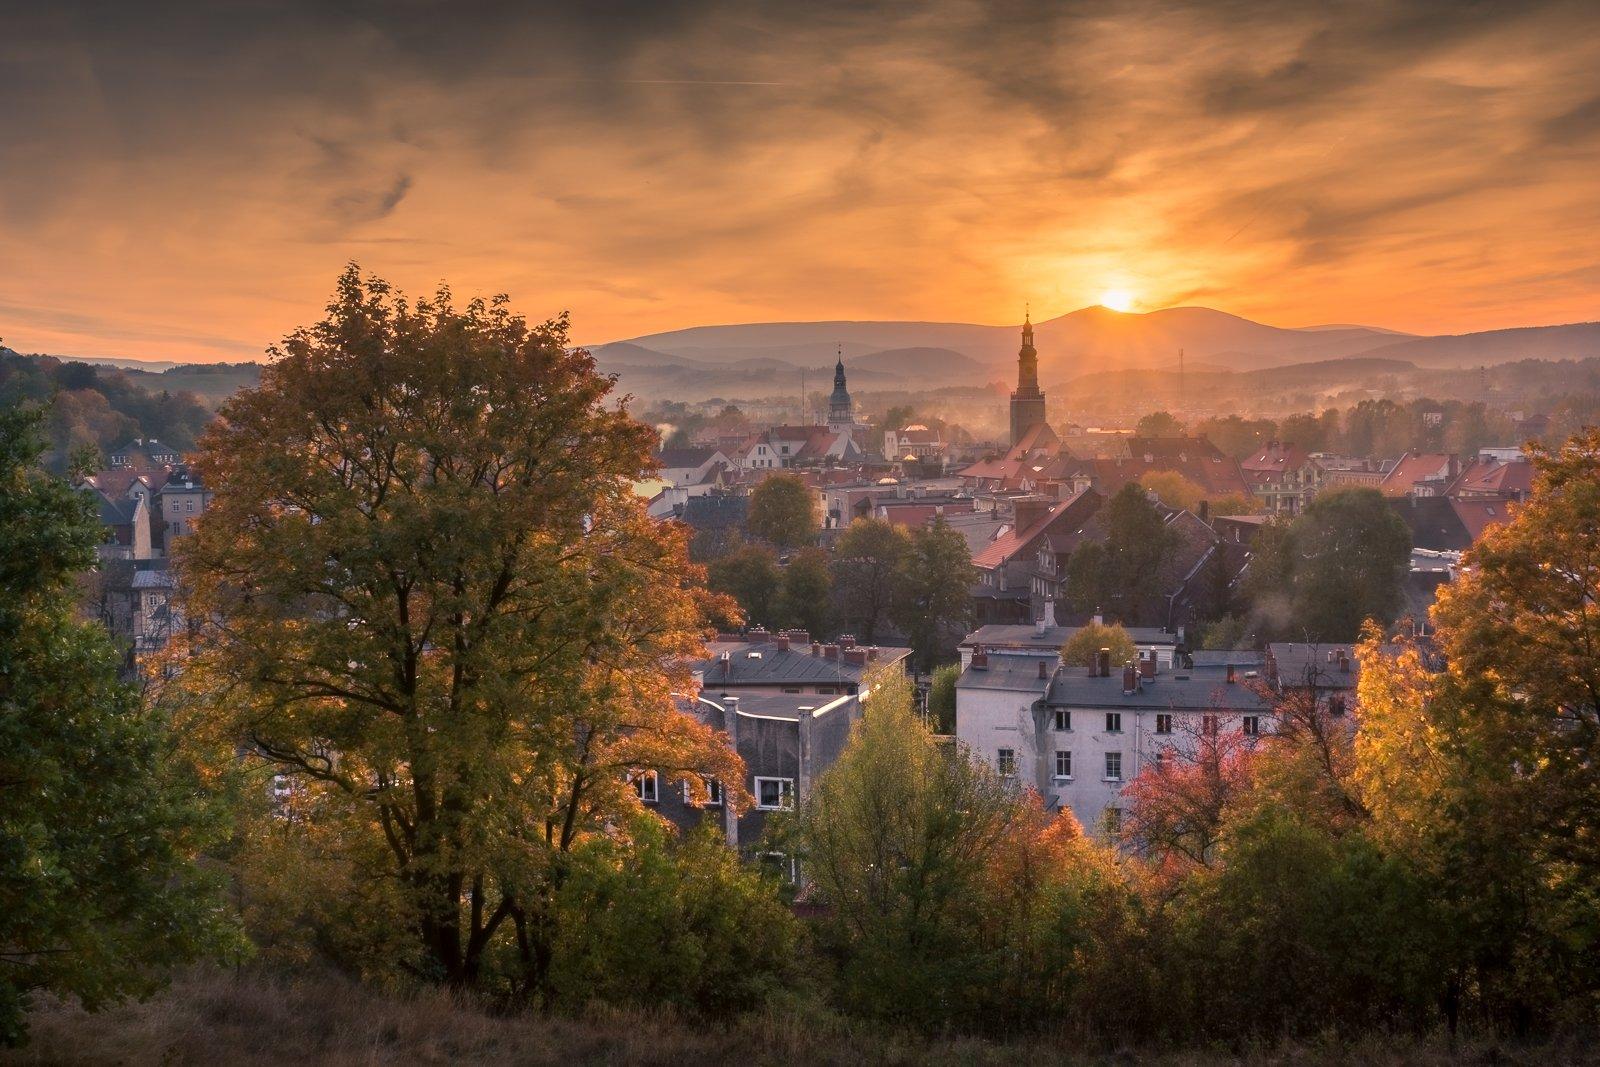 karkonosze, mountains, sniezka, kamienna, gora, autumn, landscape, nature, sunset, city,, Bociarski Artur